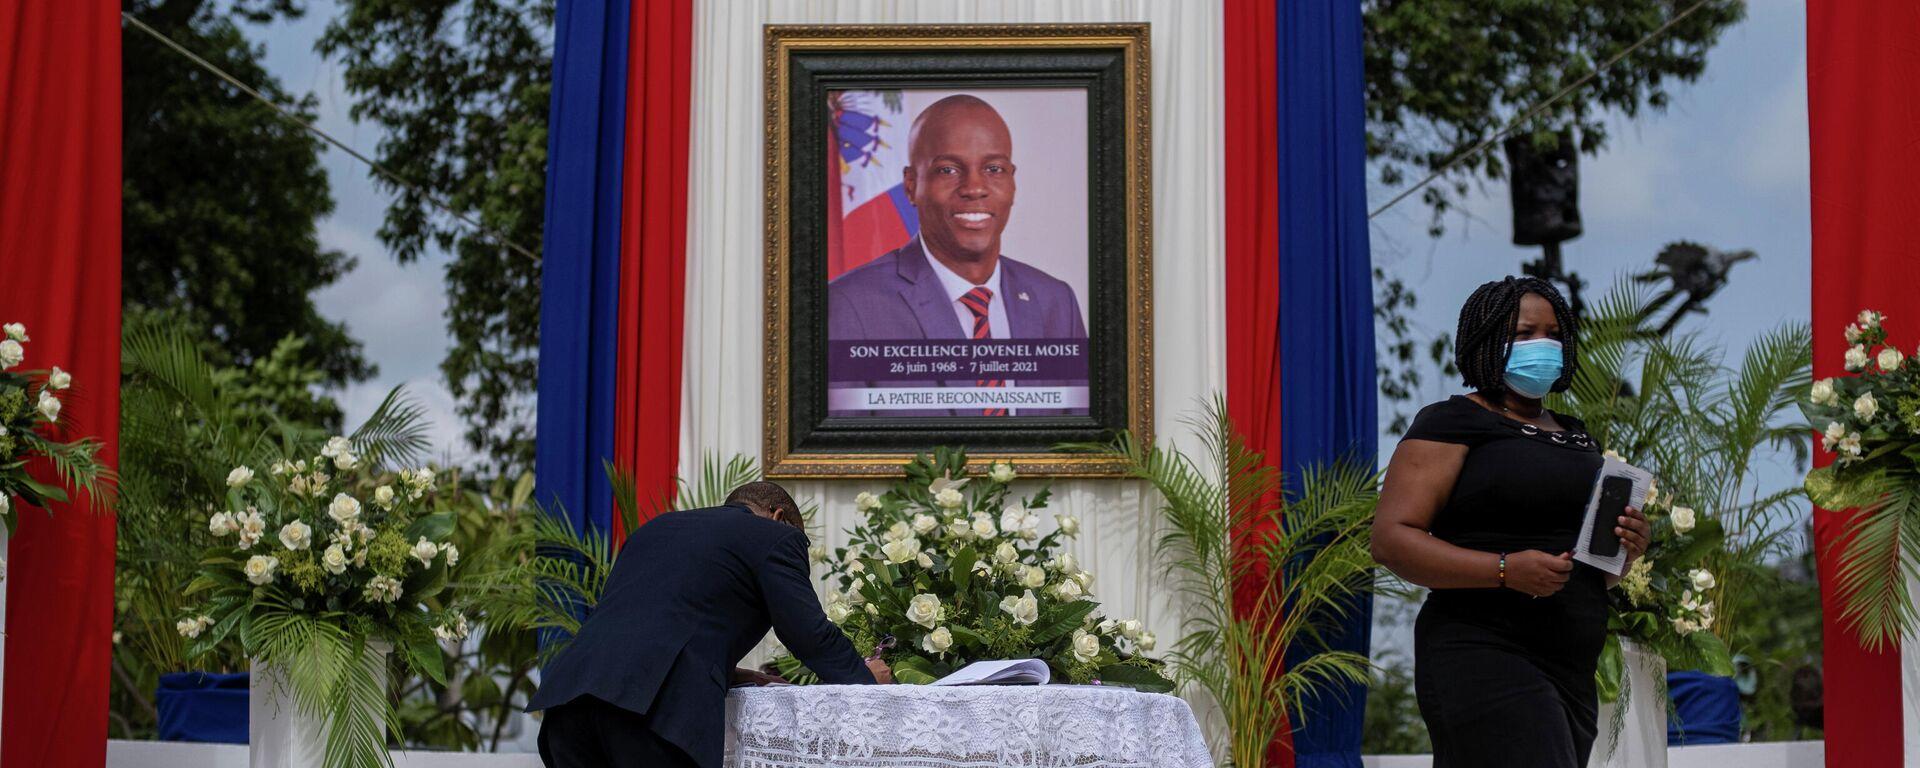 Ceremonioa en honor al expresidente de Haití, Jovenel Moise - Sputnik Mundo, 1920, 13.08.2021